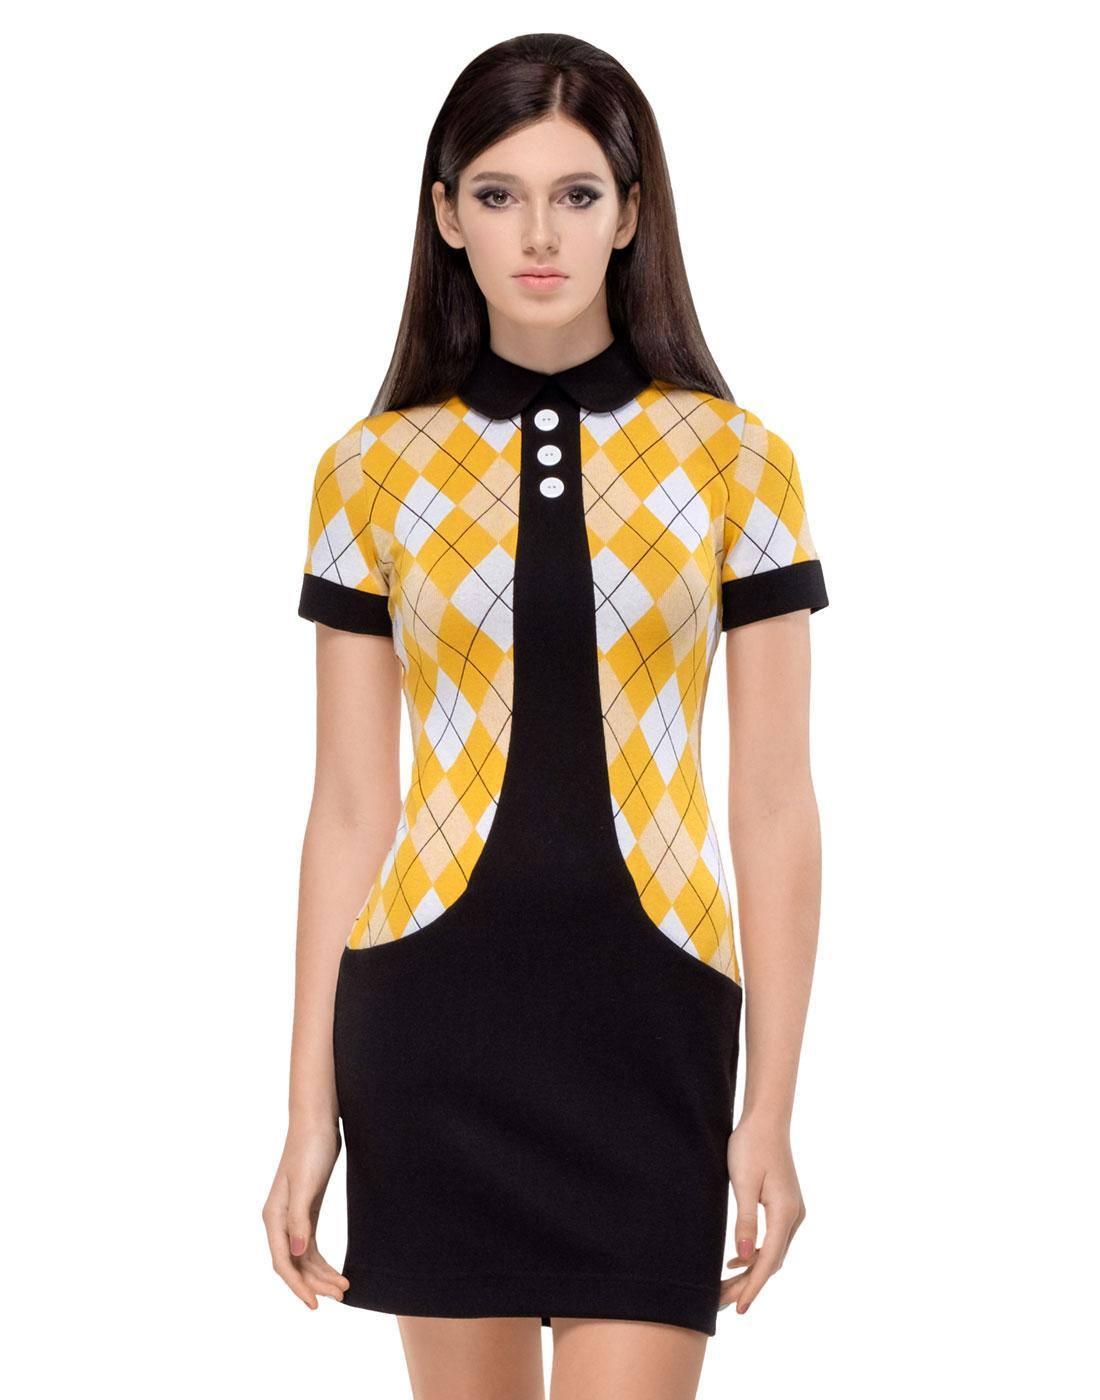 MARMALADE Retro Yellow Argyle Mod Sixties Dress